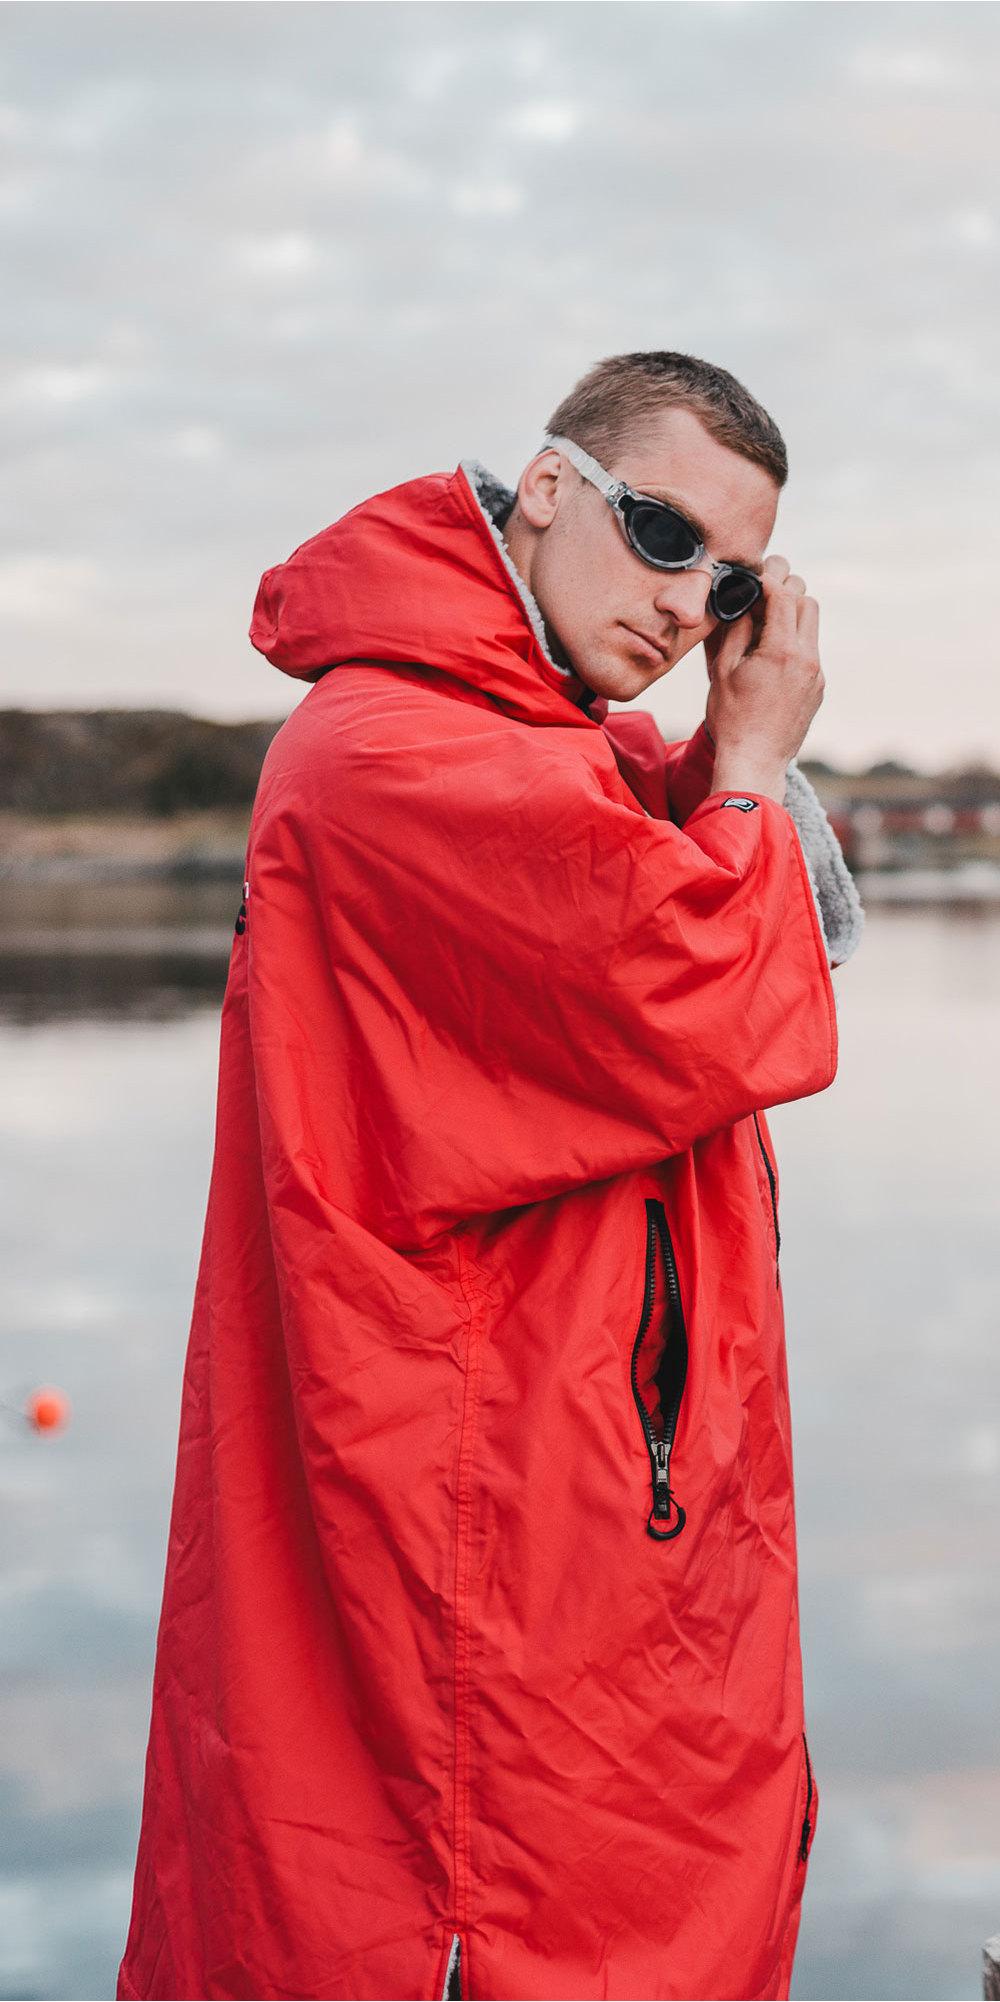 2019 Dryrobe Short Dryrobe Premium Outdoor Robe / Poncho Dr100 Rojo / Gris